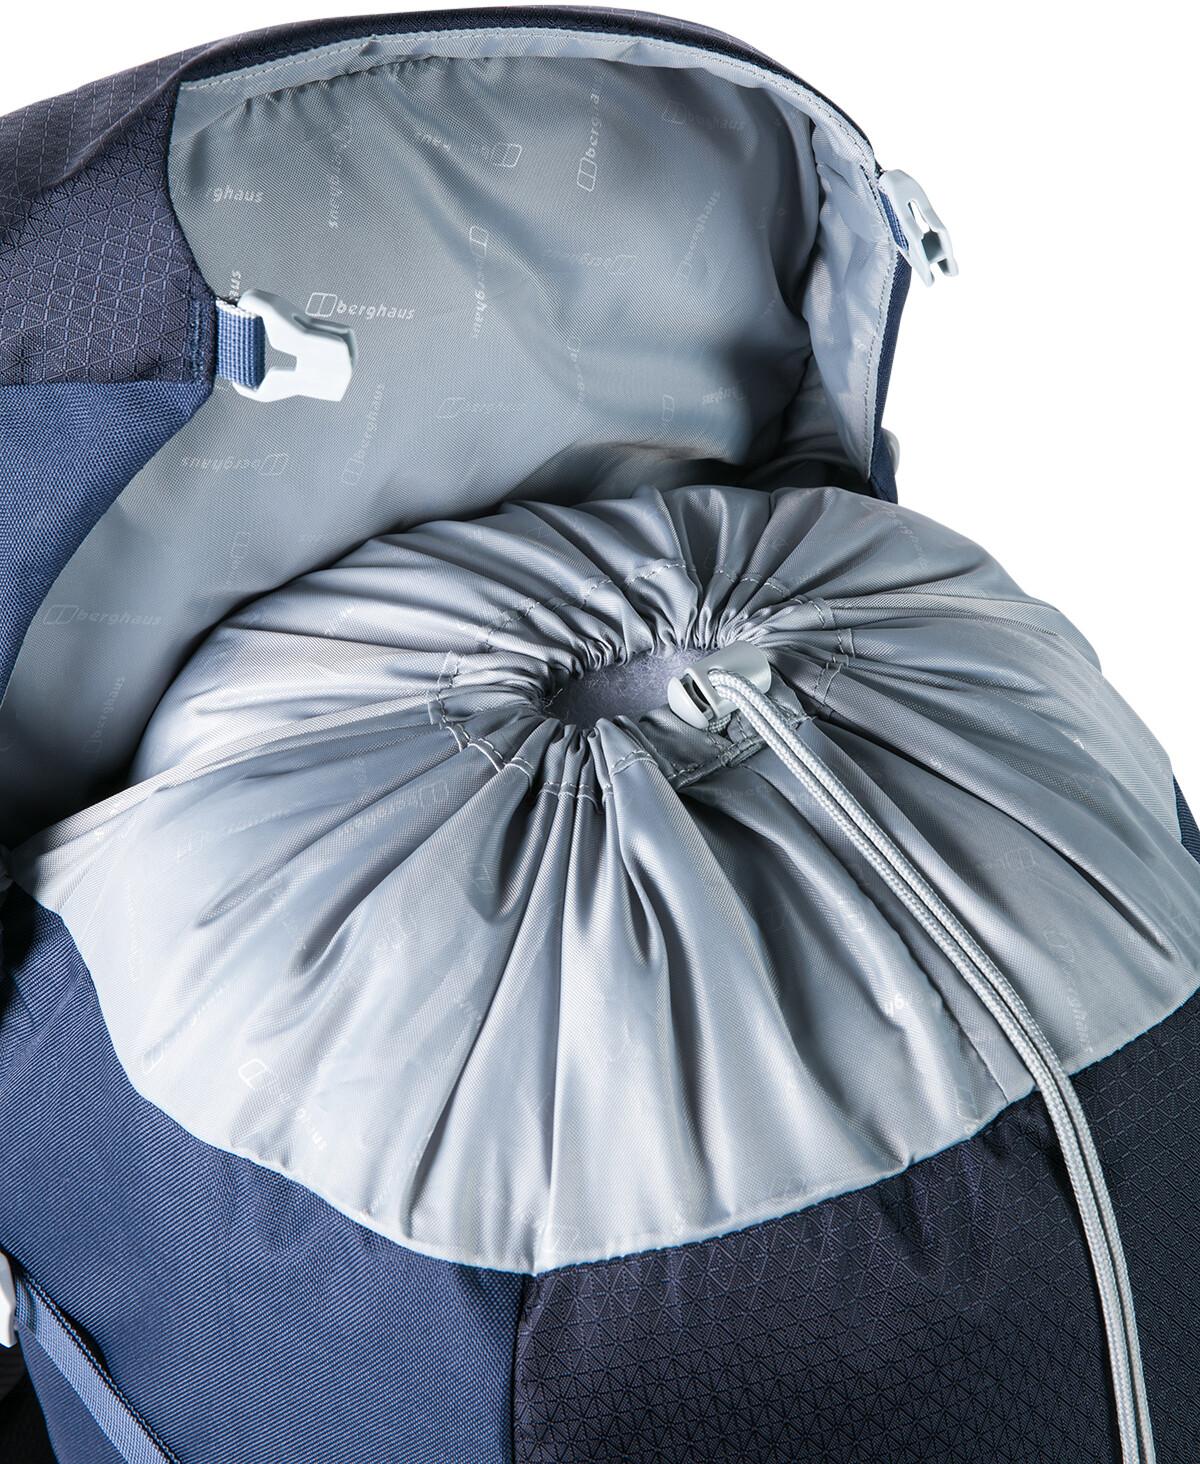 Berghaus Trailhead 65 Backpack Damen dusk